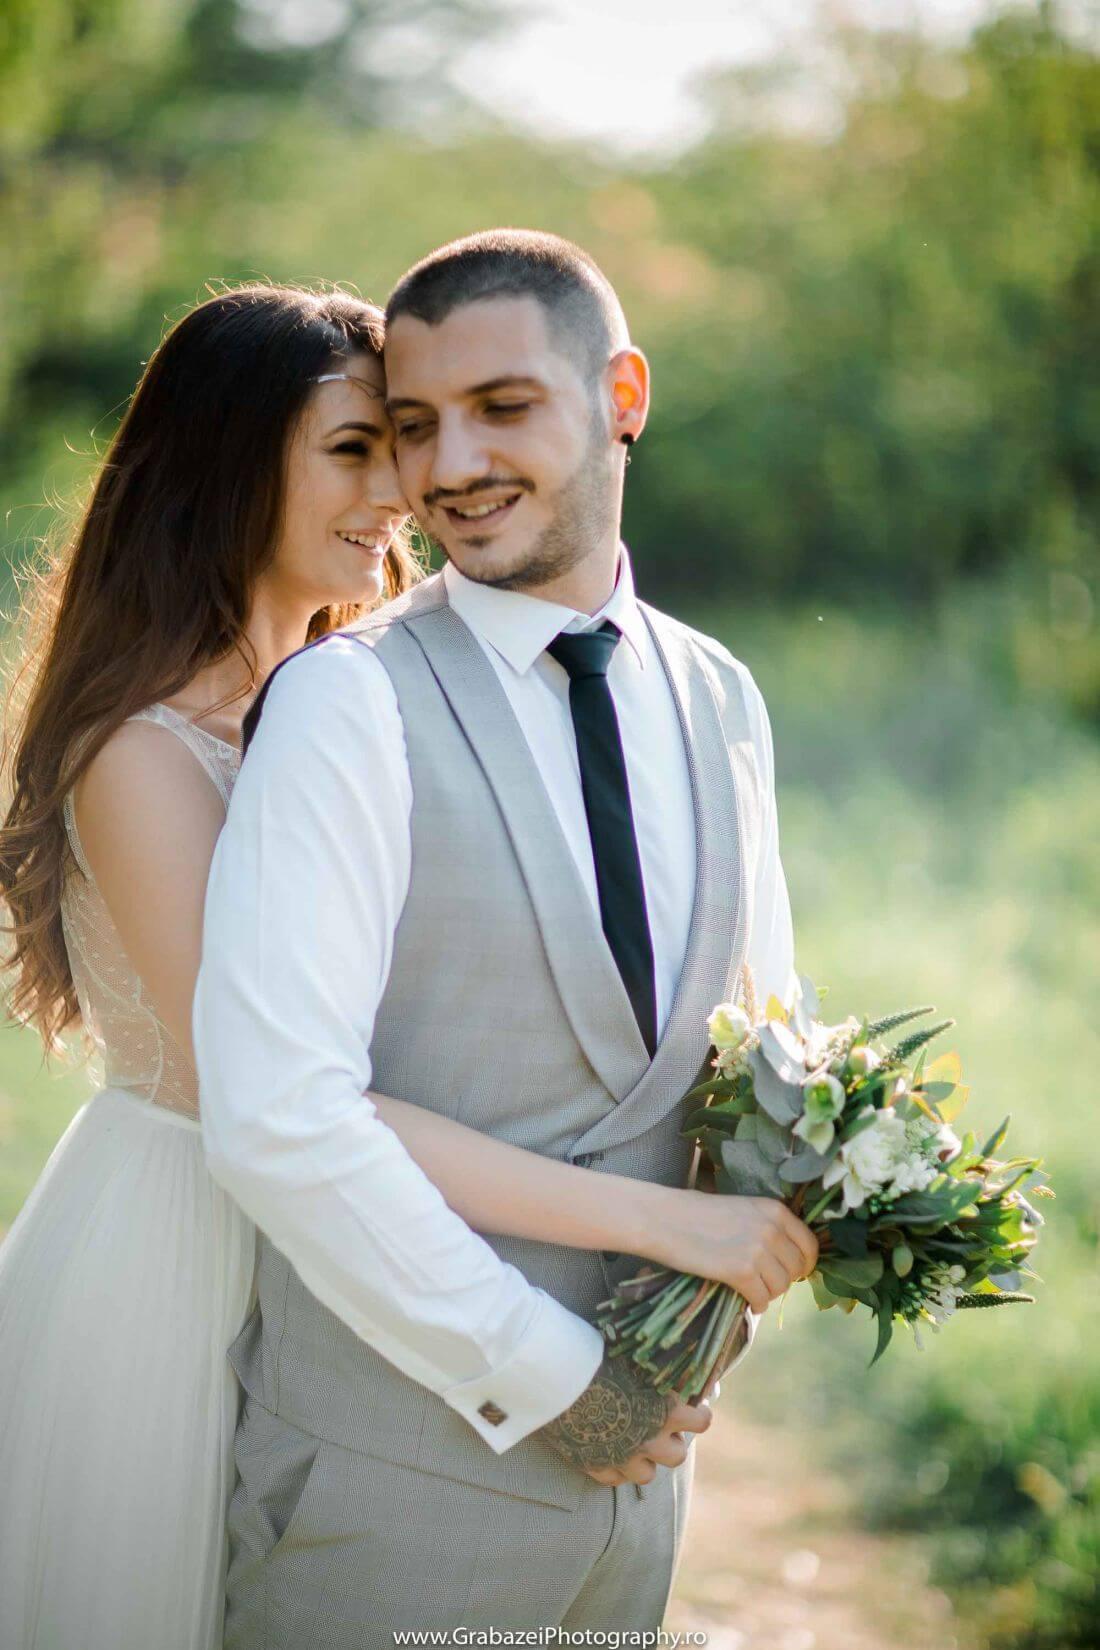 Nunta cu bumbac – Cristina si Sergiu – IDO-Weddings-nuntiinaerliber (12)